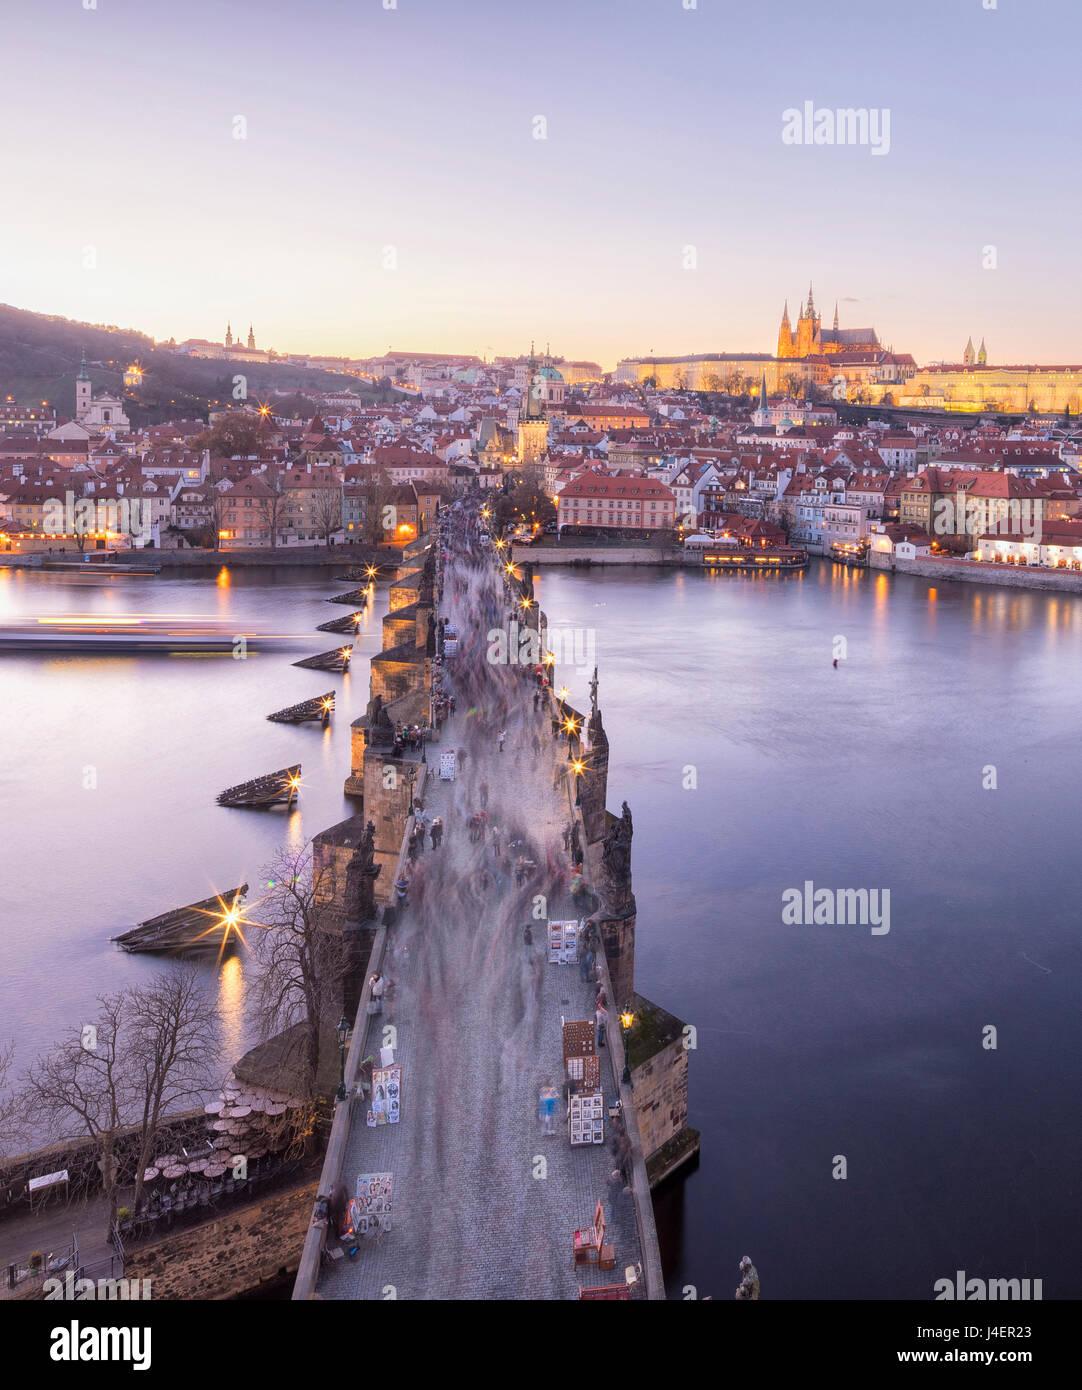 Vltava River and by Charles Bridge at sunset, UNESCO World Heritage Site, Prague, Czech Republic, Europe - Stock Image